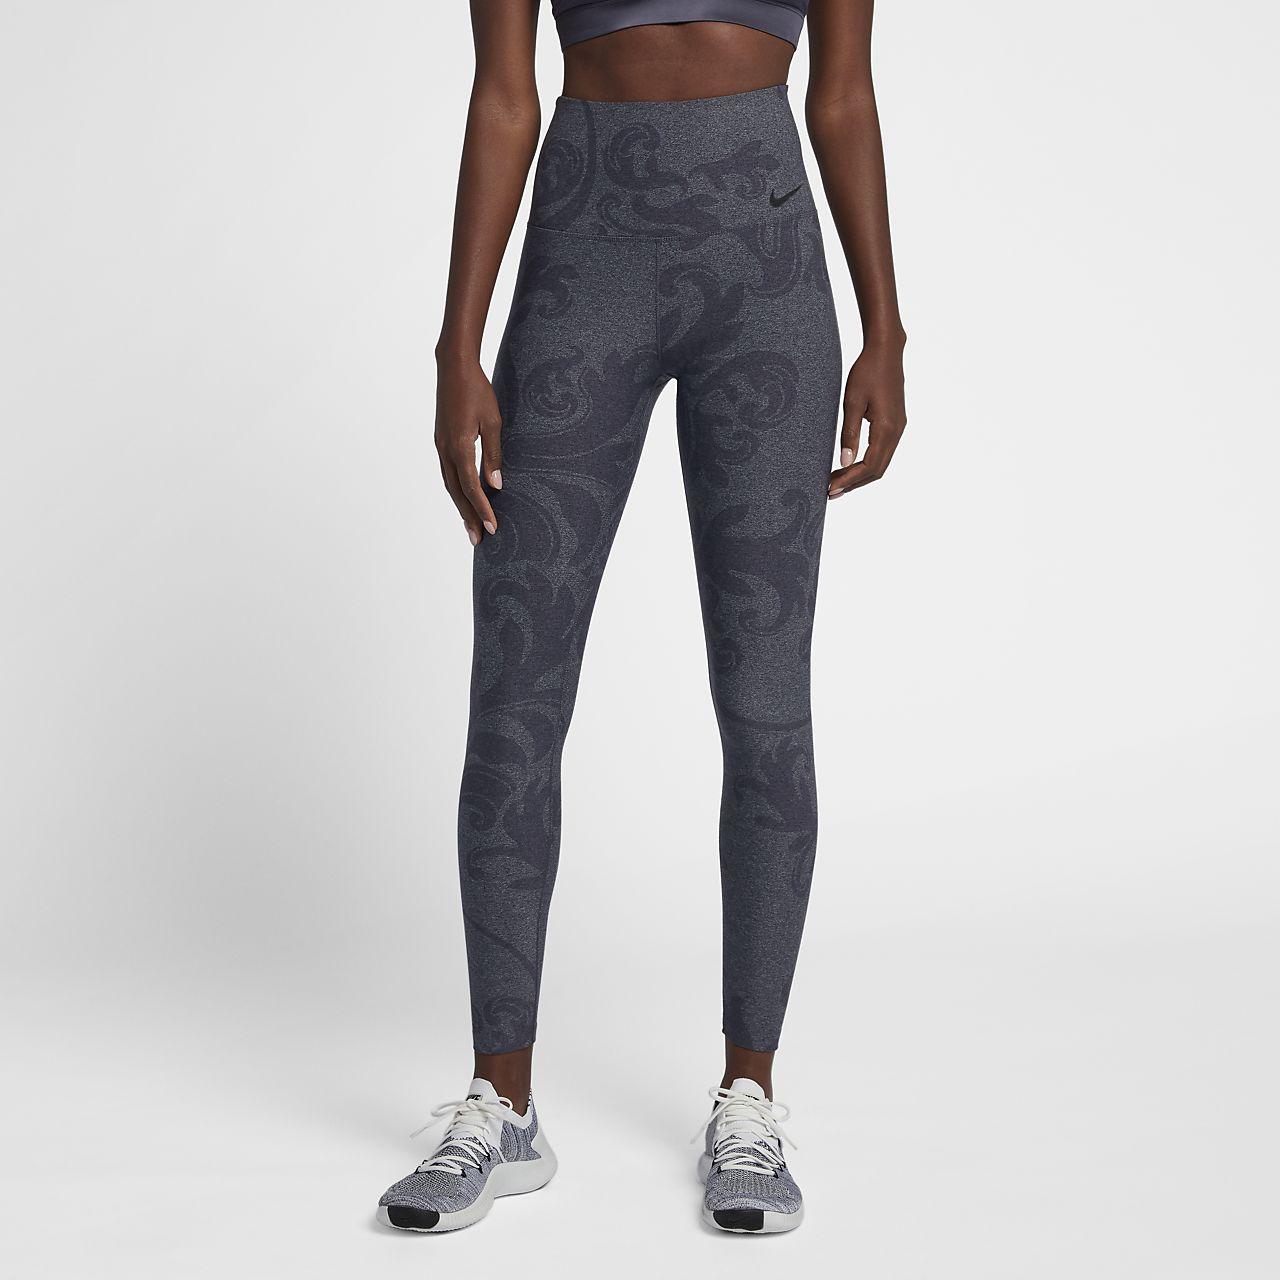 Nike Dri-FIT Power Studio Women s Printed Training Tights. Nike.com GB 2a327b78c